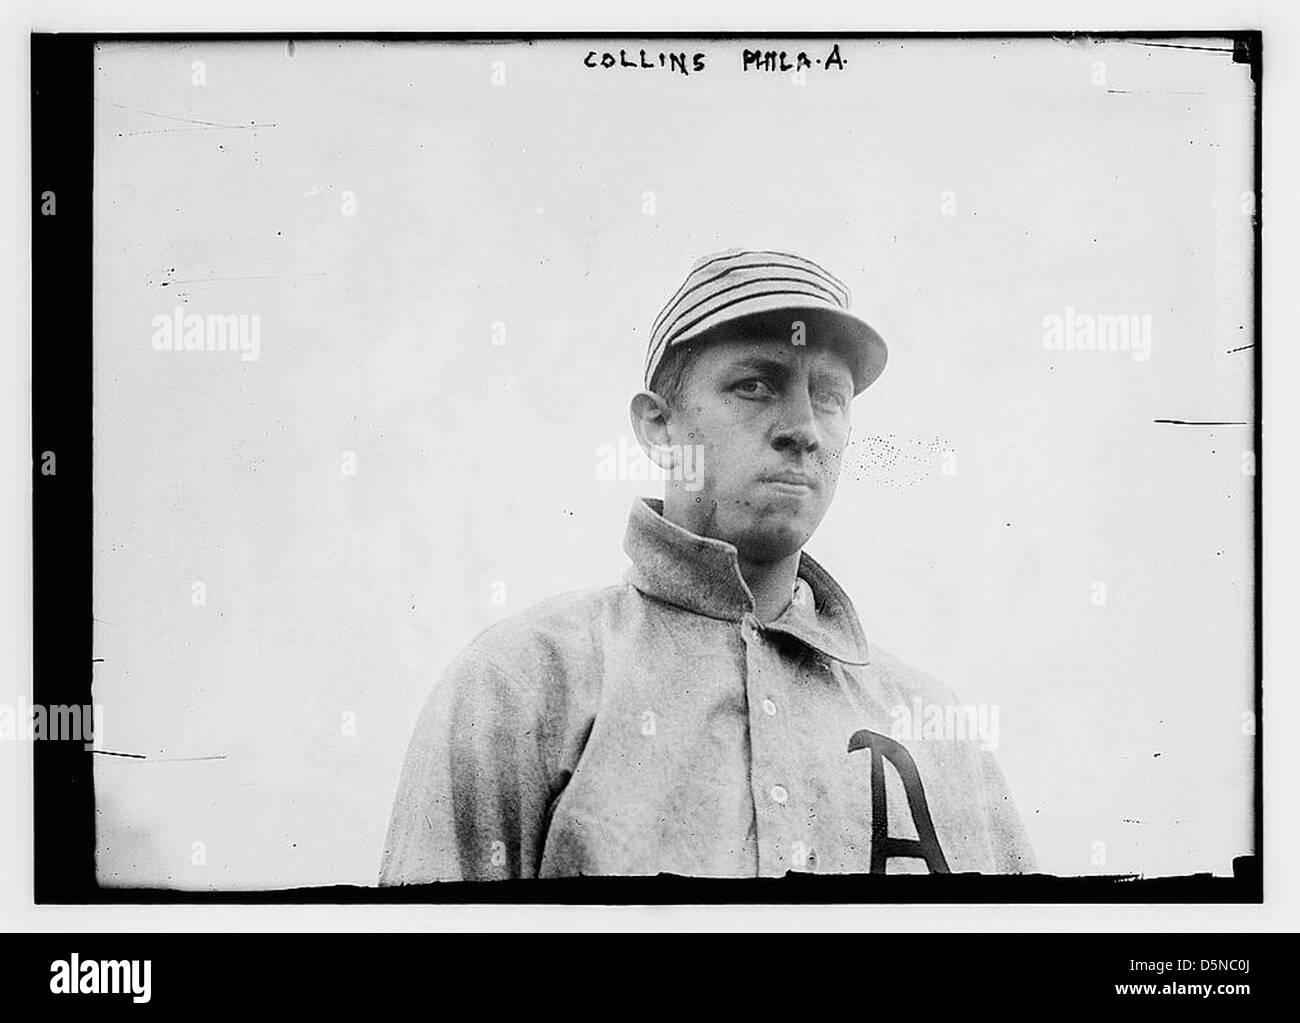 [Eddie Collins, Philadelphia, AL (baseball)] (LOC) Immagini Stock